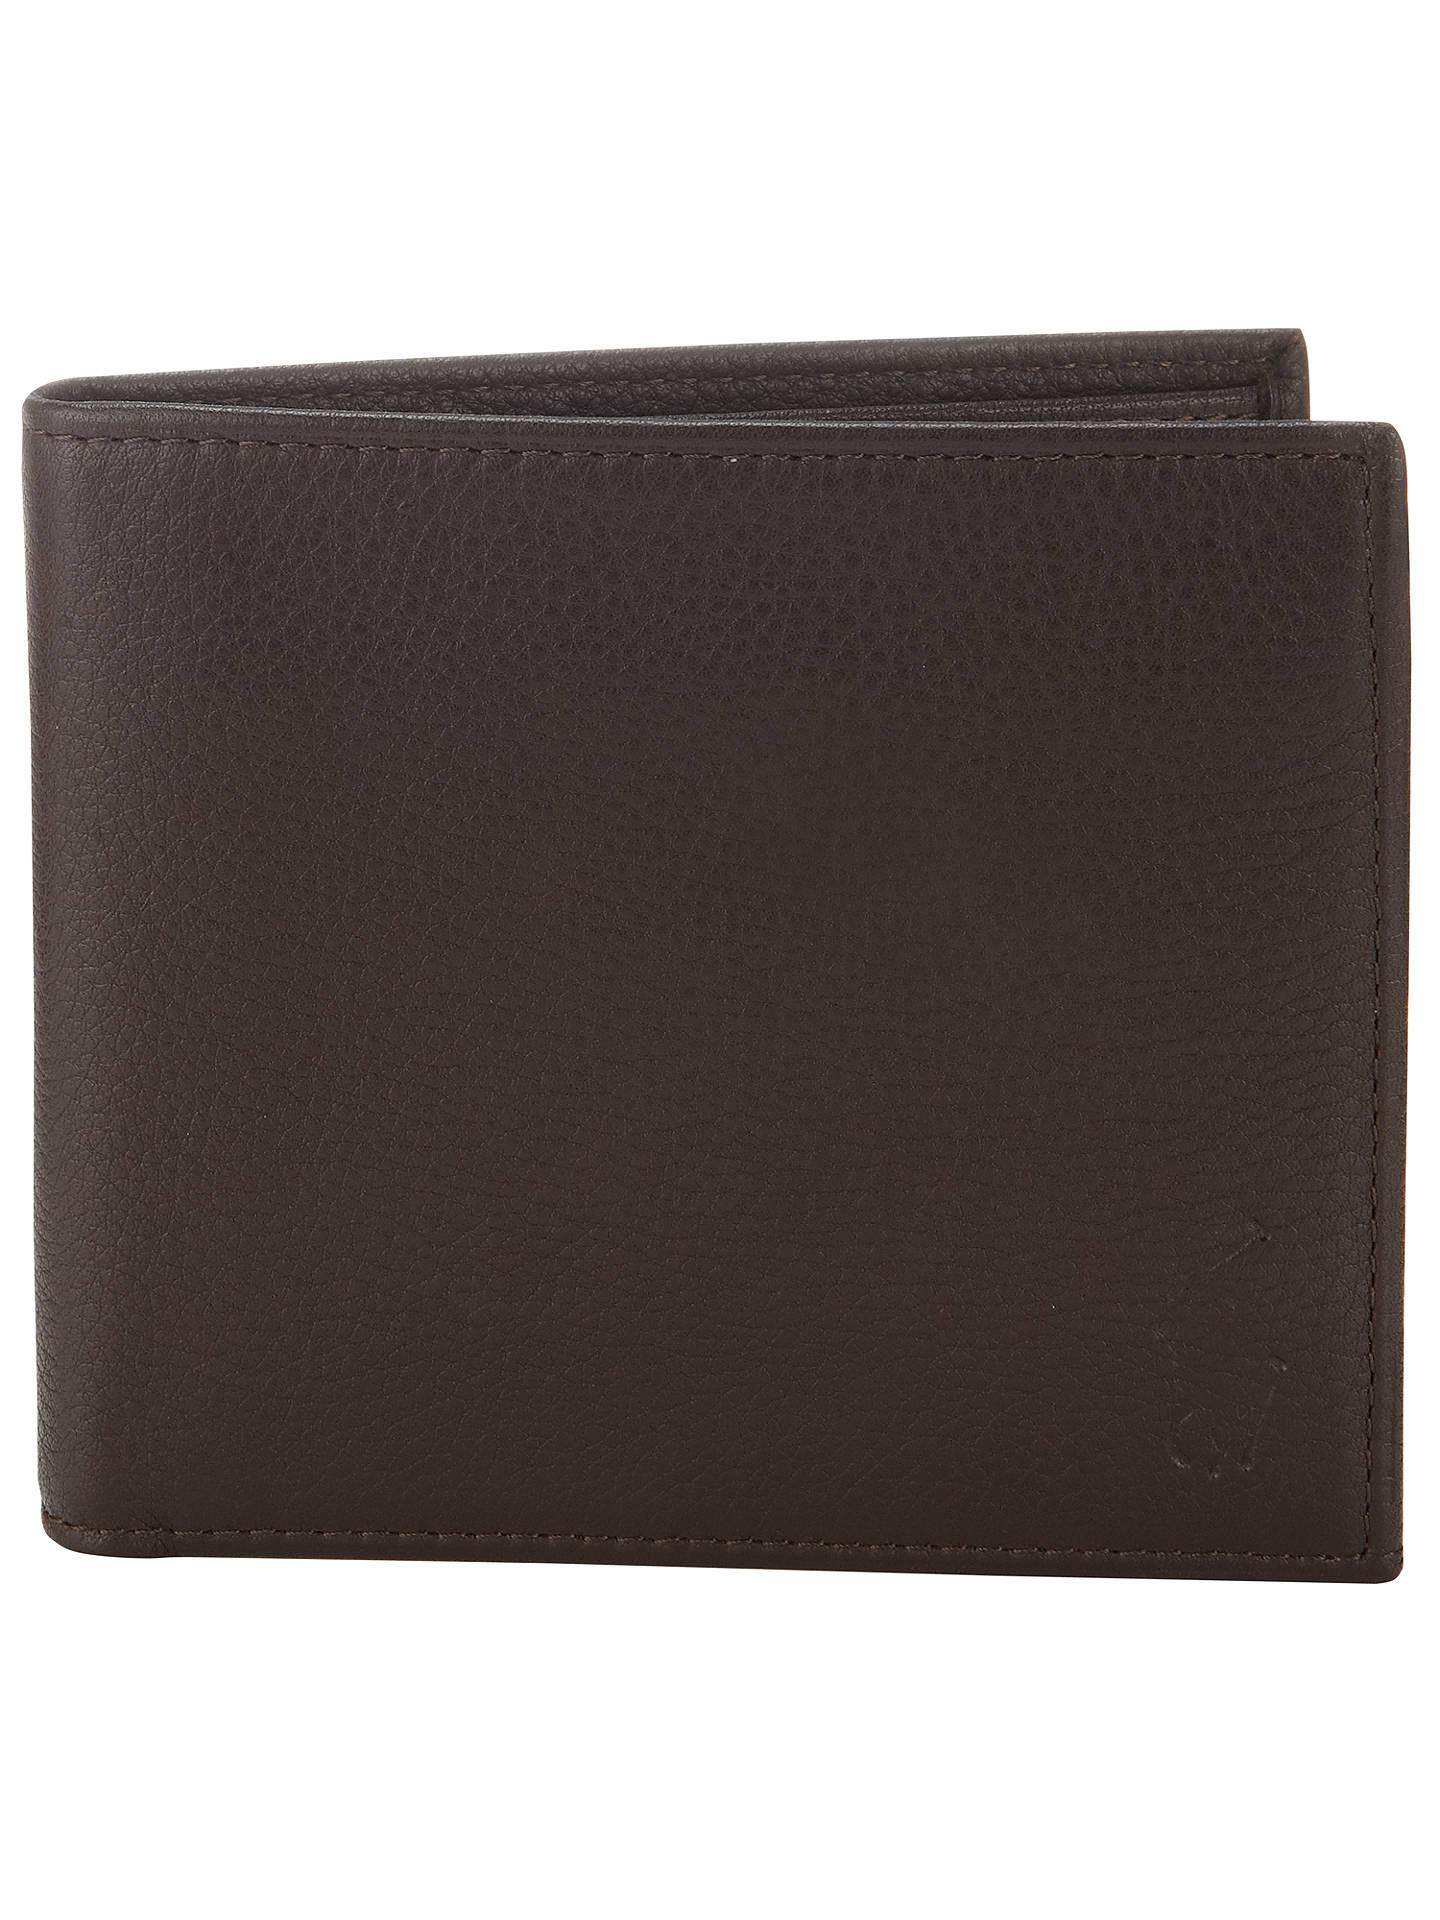 7b810f2acb4 Buy Polo Ralph Lauren Pebble Grain Leather Wallet, Brown Online at  johnlewis.com ...